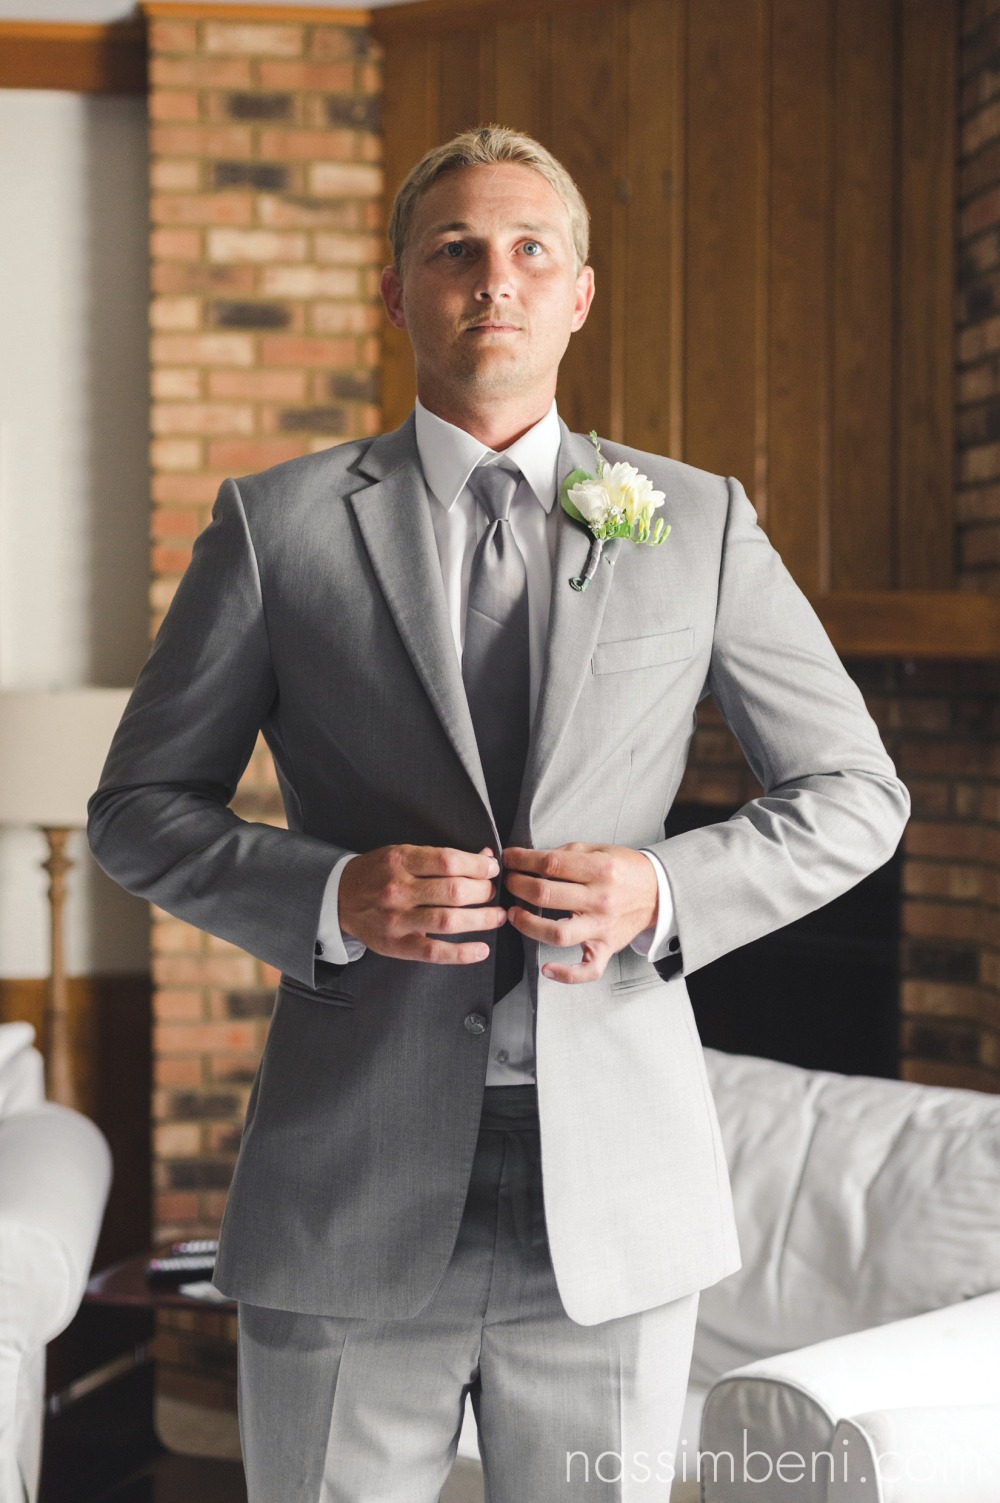 groom prep in vero beach florida wedding venue by nassimbeni photography